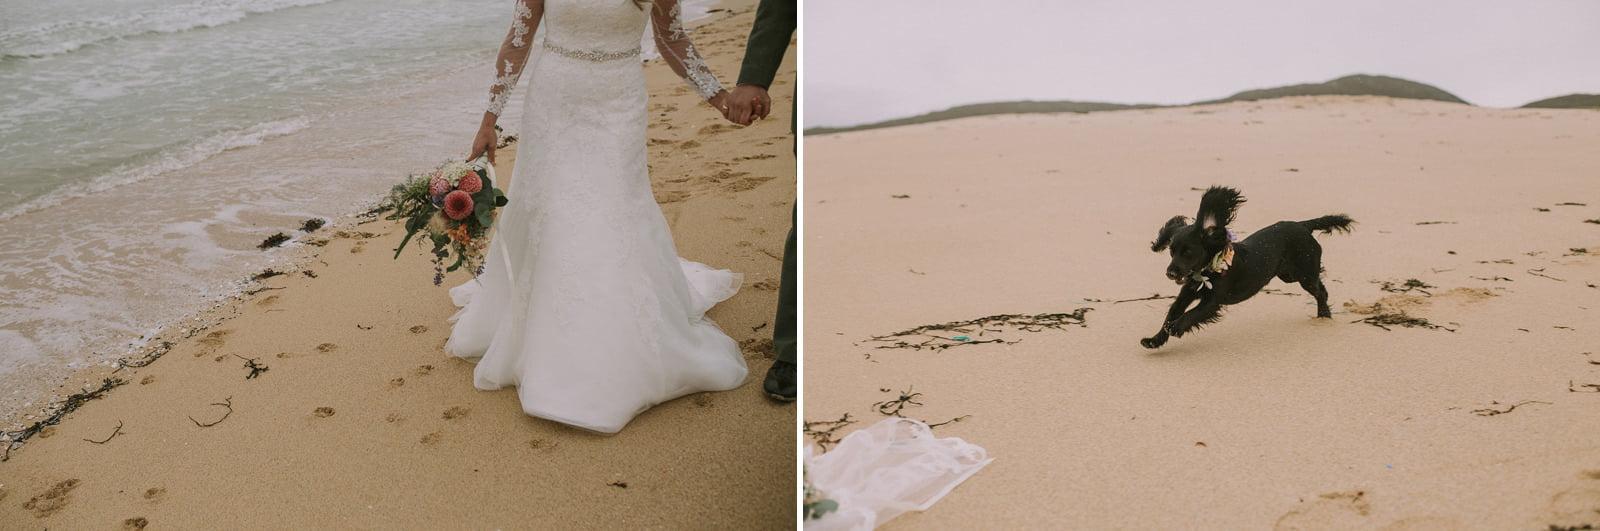 harris isle of wedding